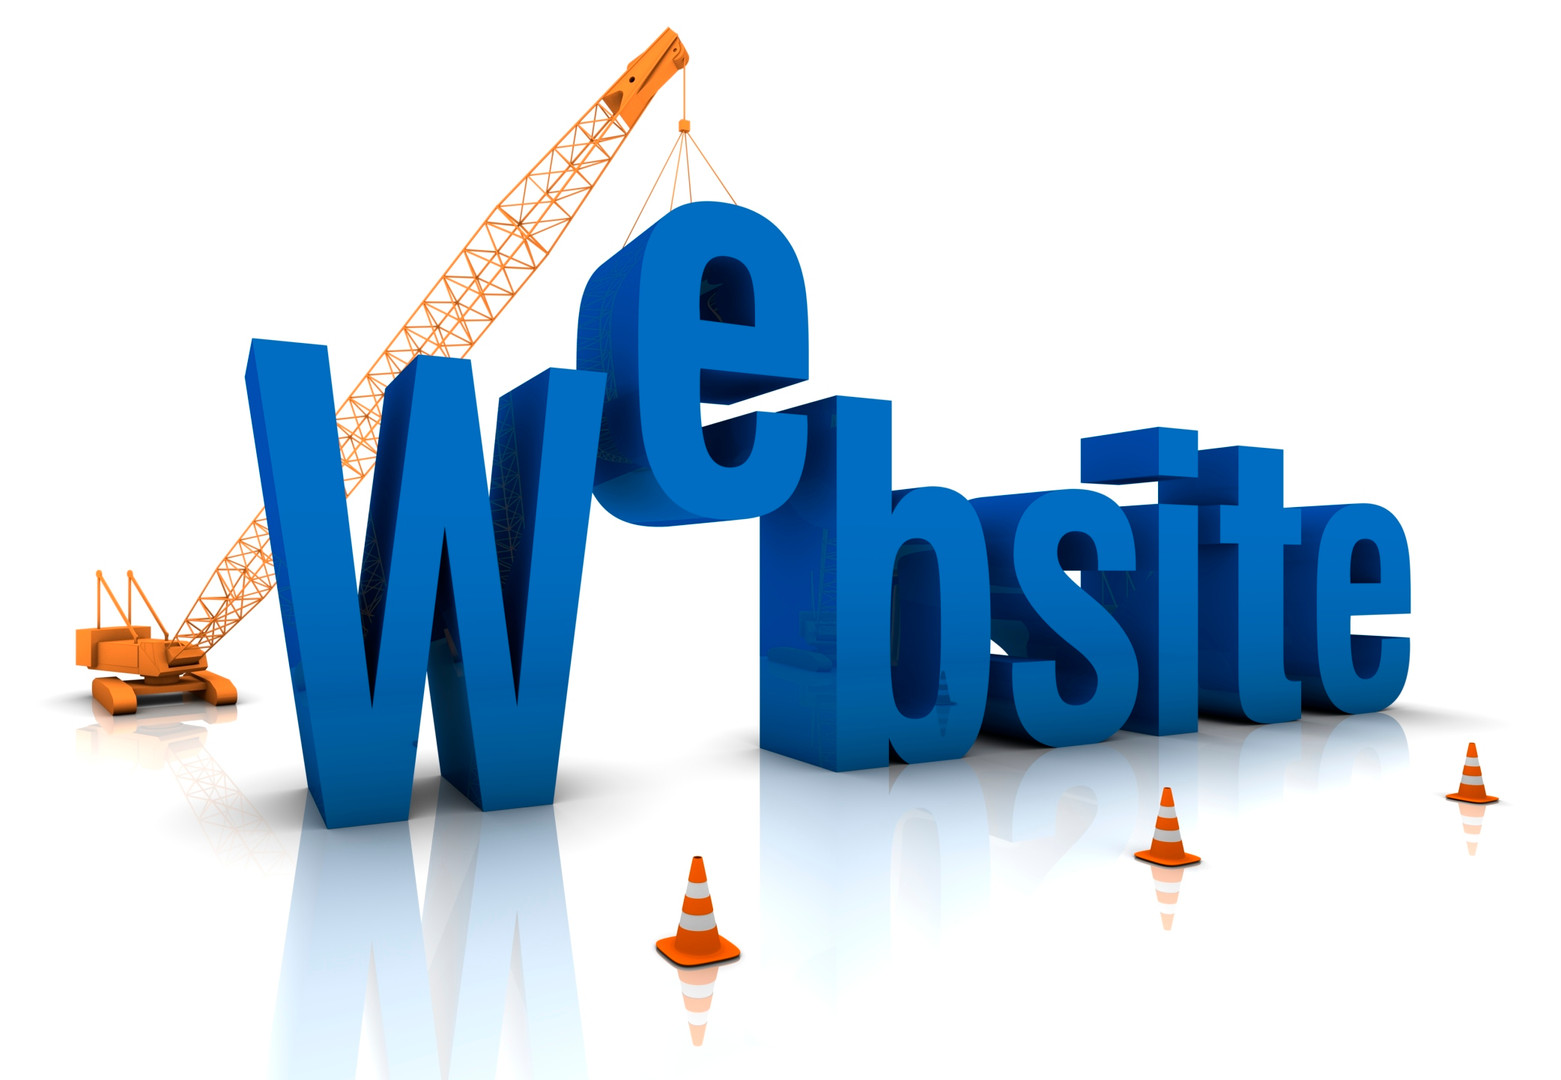 website-builder.jpg